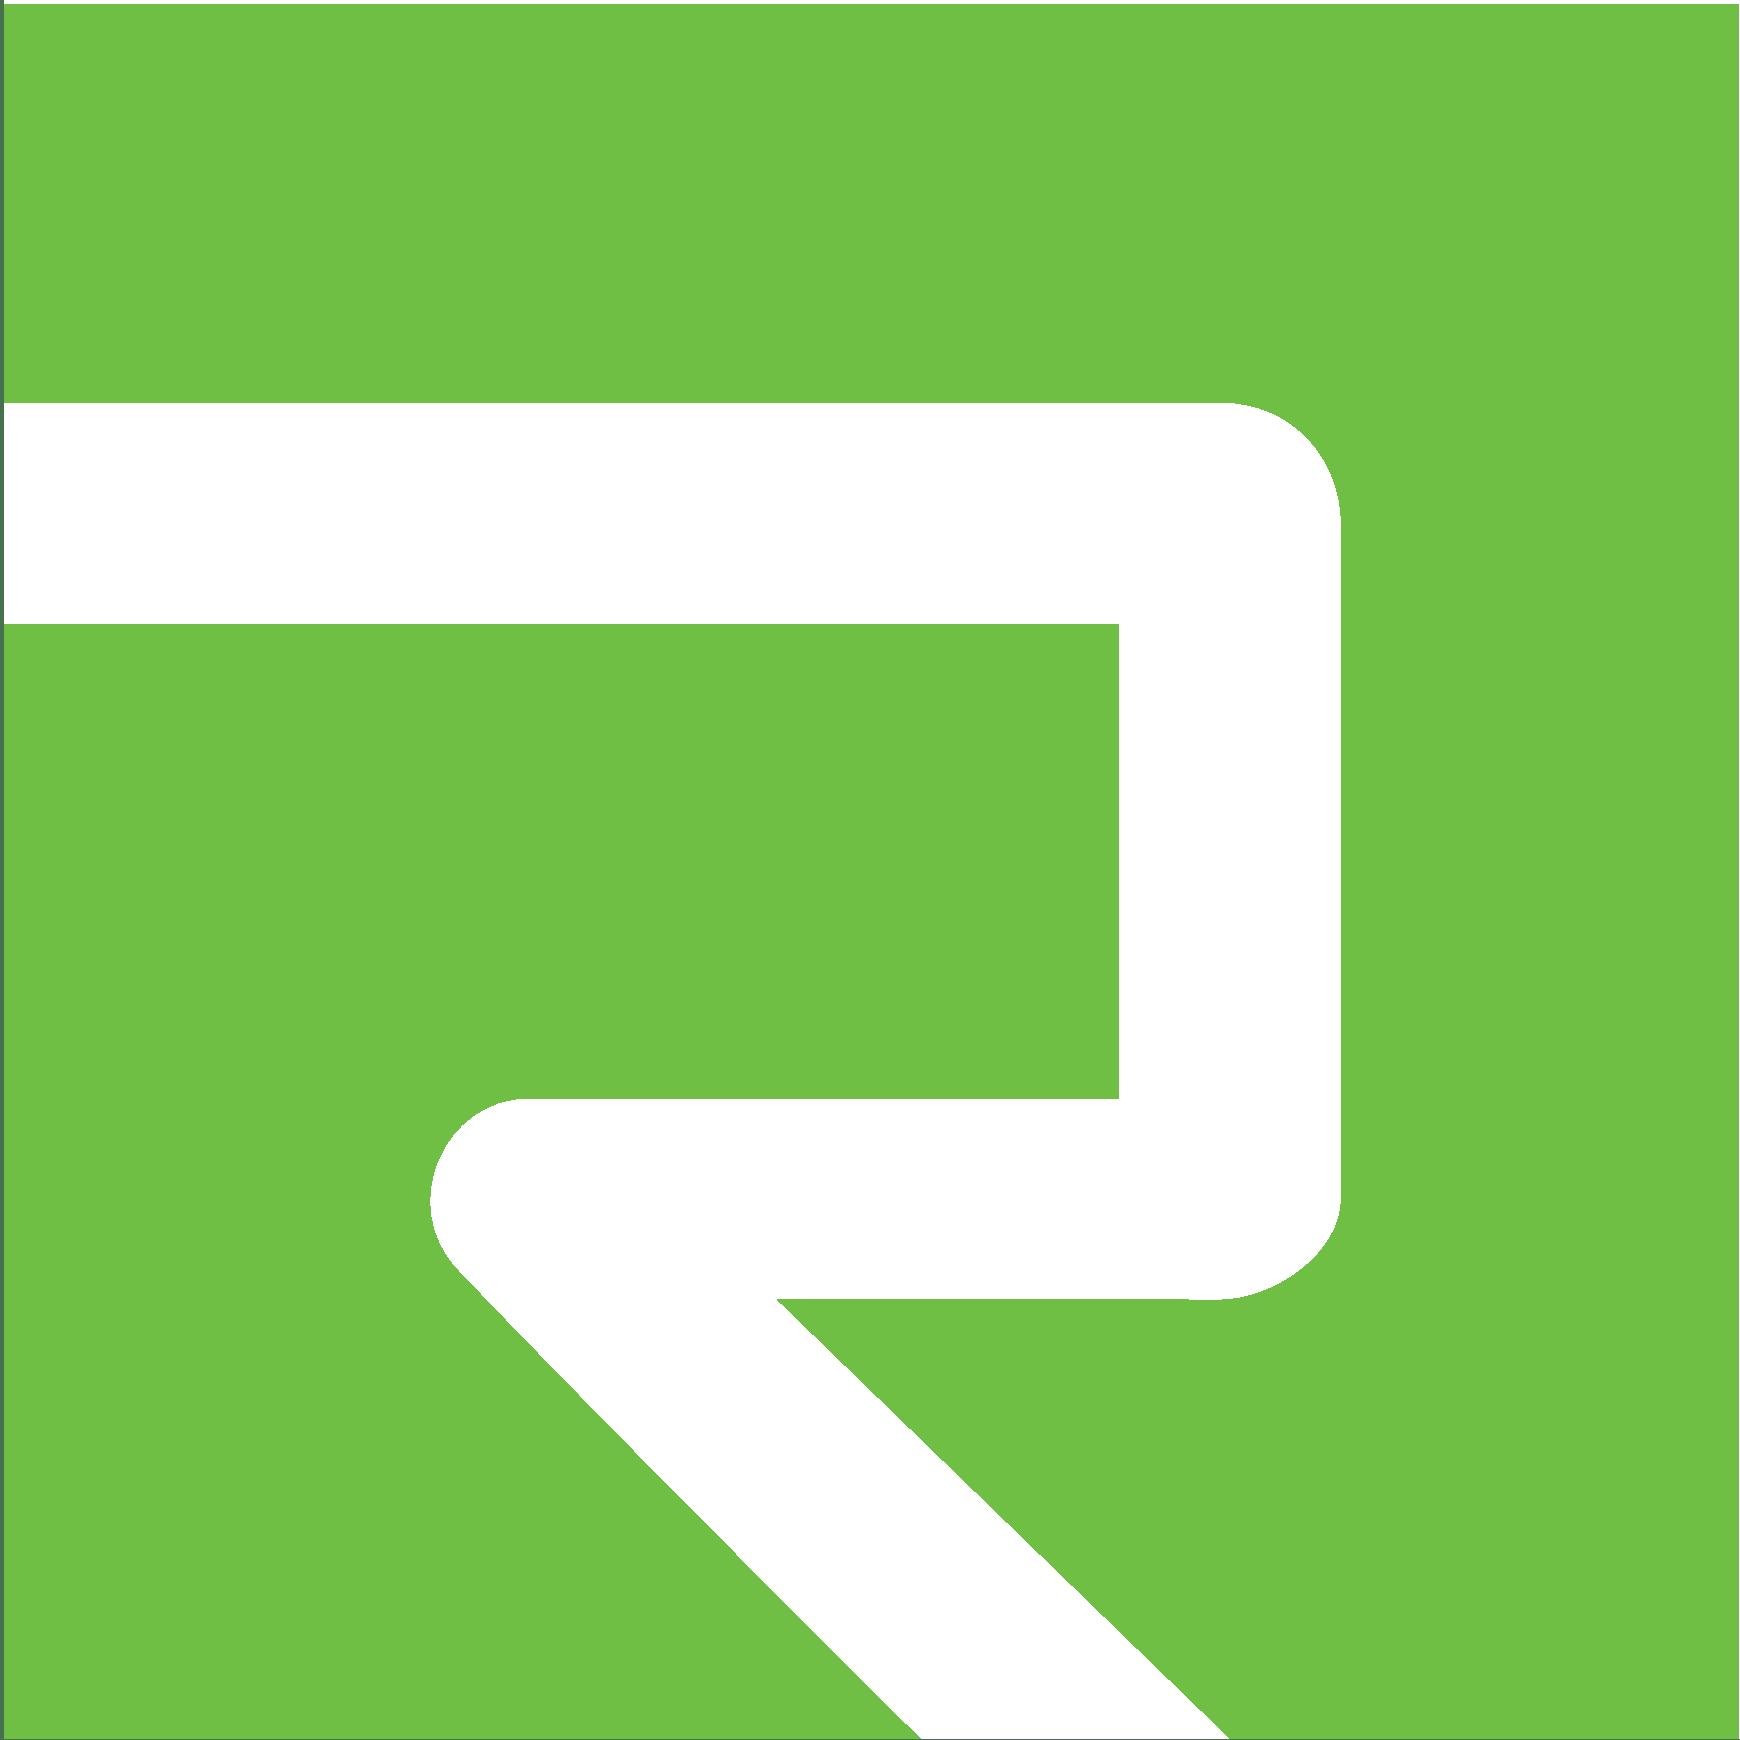 rabb_logo_favicon